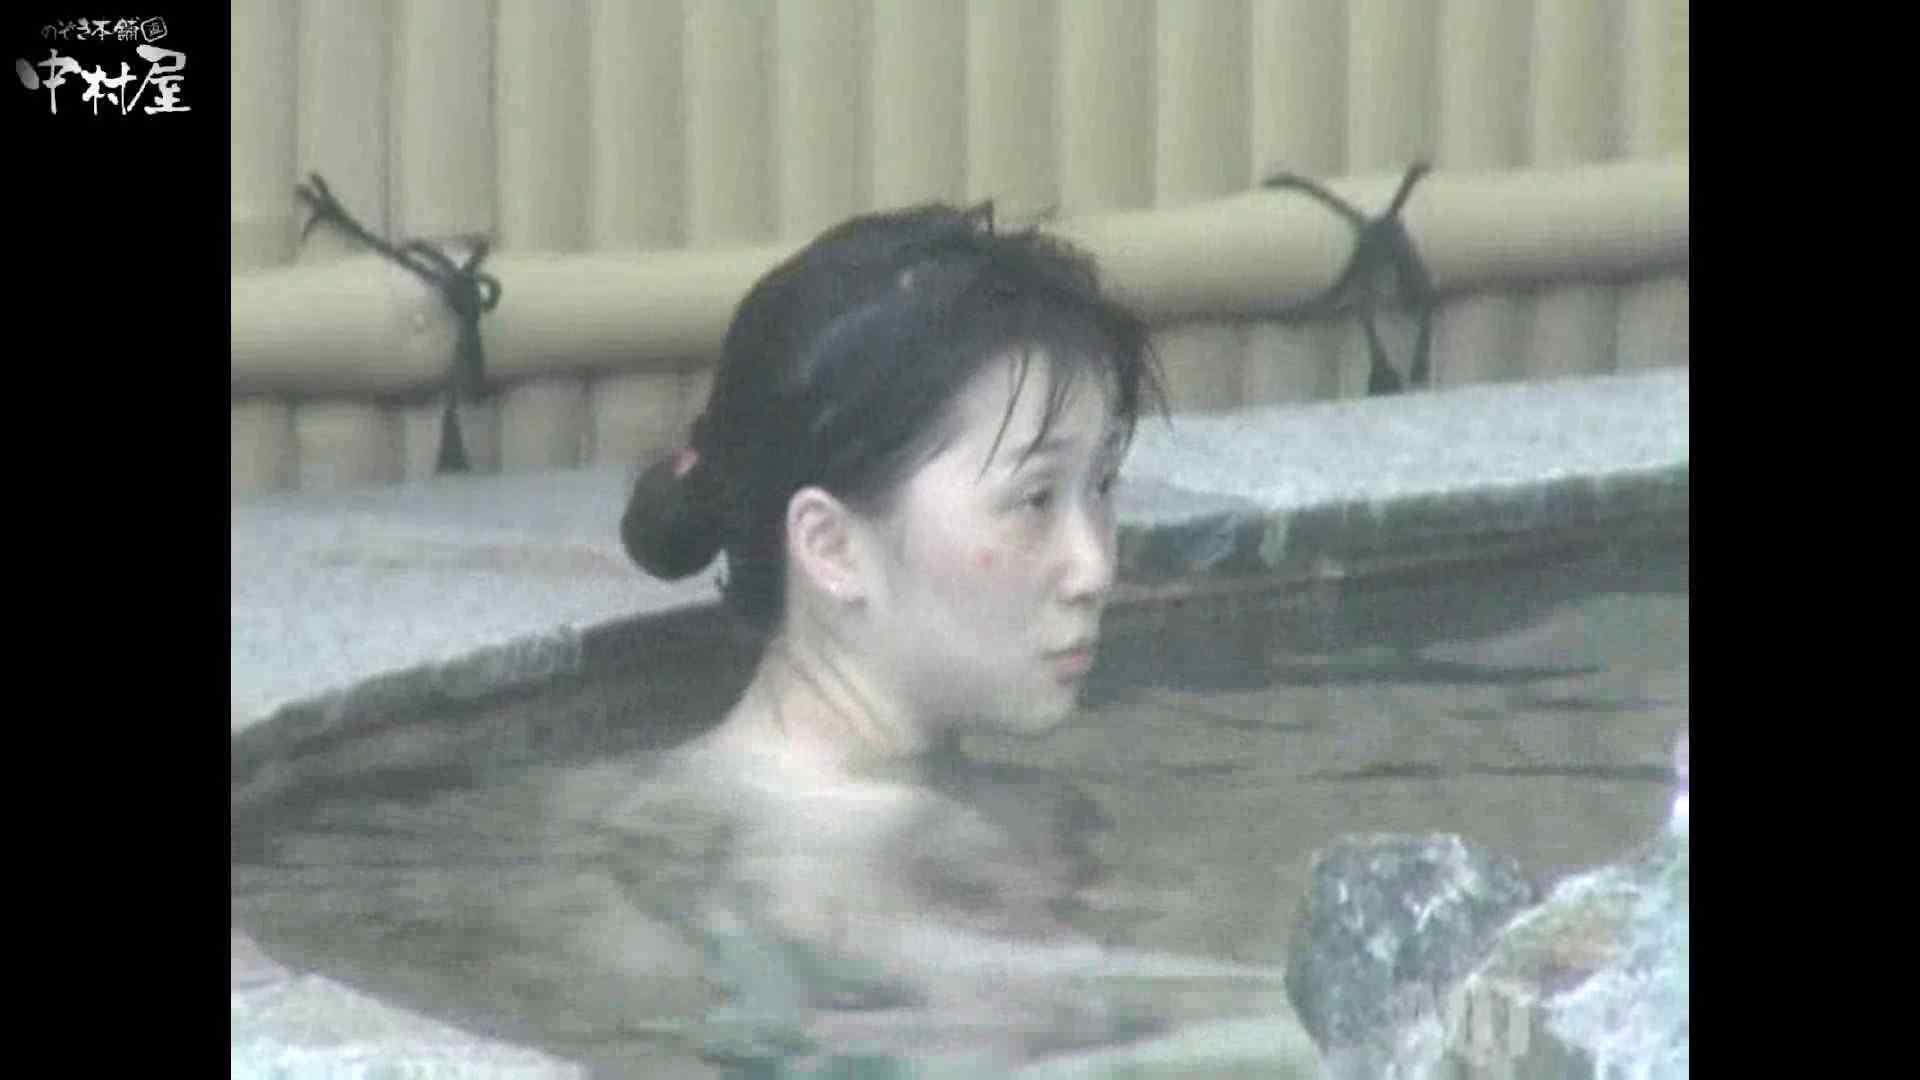 Aquaな露天風呂Vol.878潜入盗撮露天風呂十五判湯 其の一 盗撮師作品 おまんこ動画流出 74pic 54